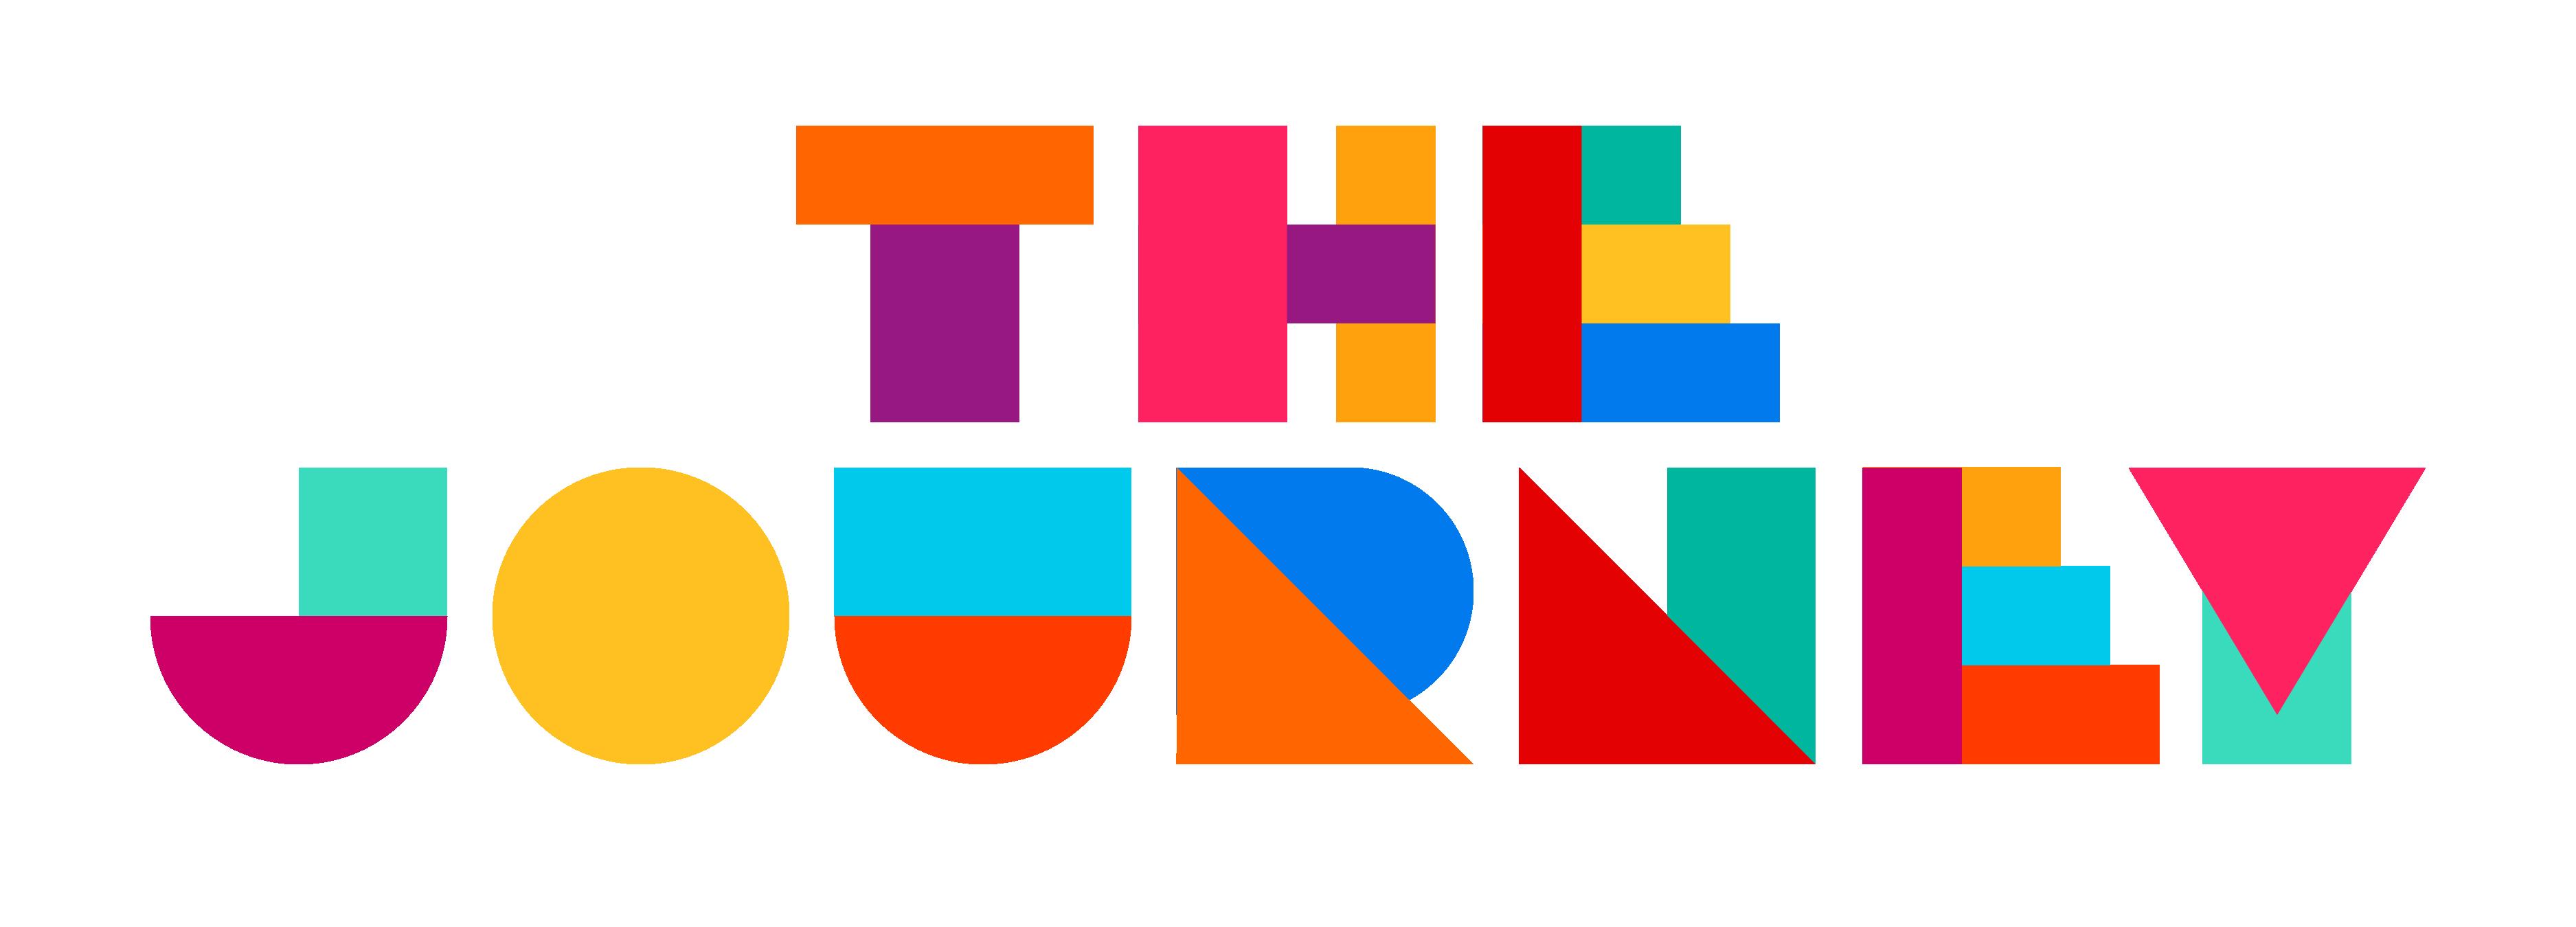 nyi the journey logo centered